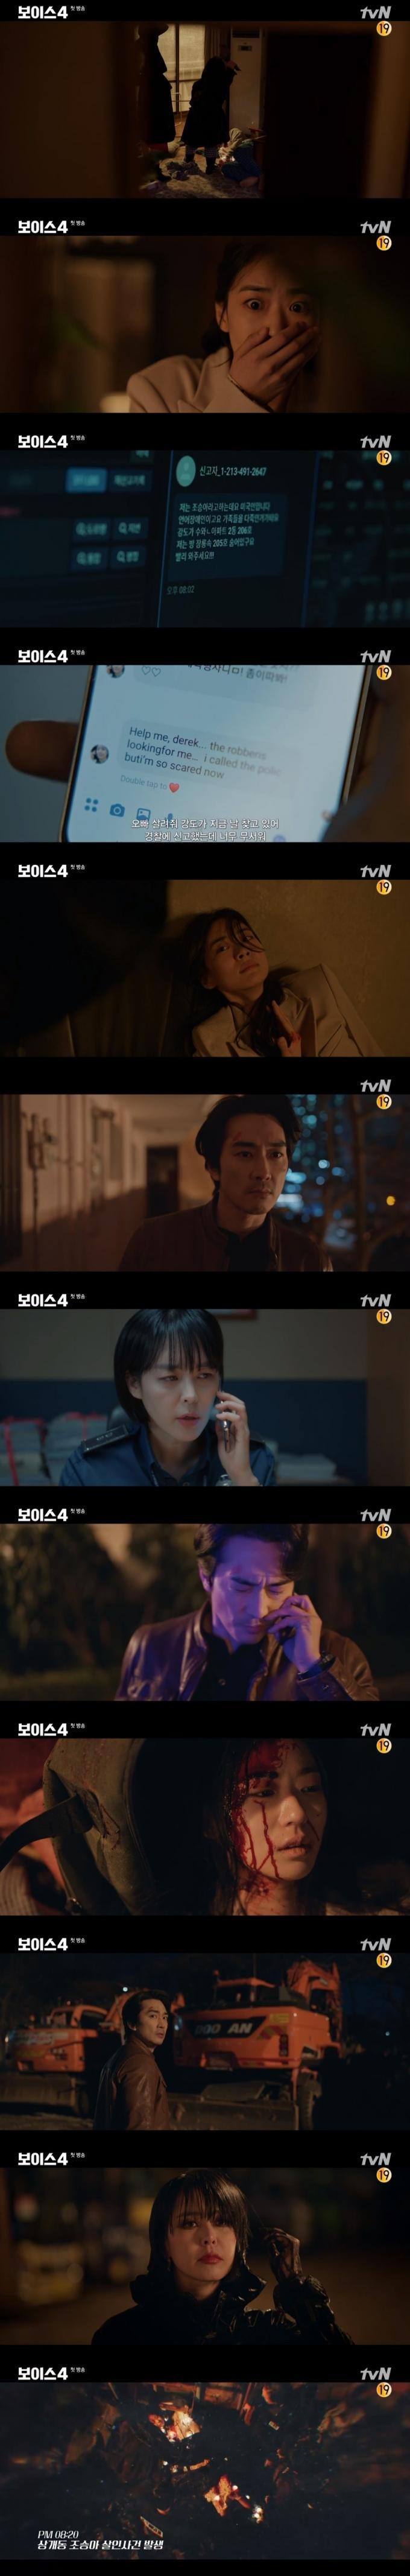 tvN '보이스4' 캡처 © 뉴스1